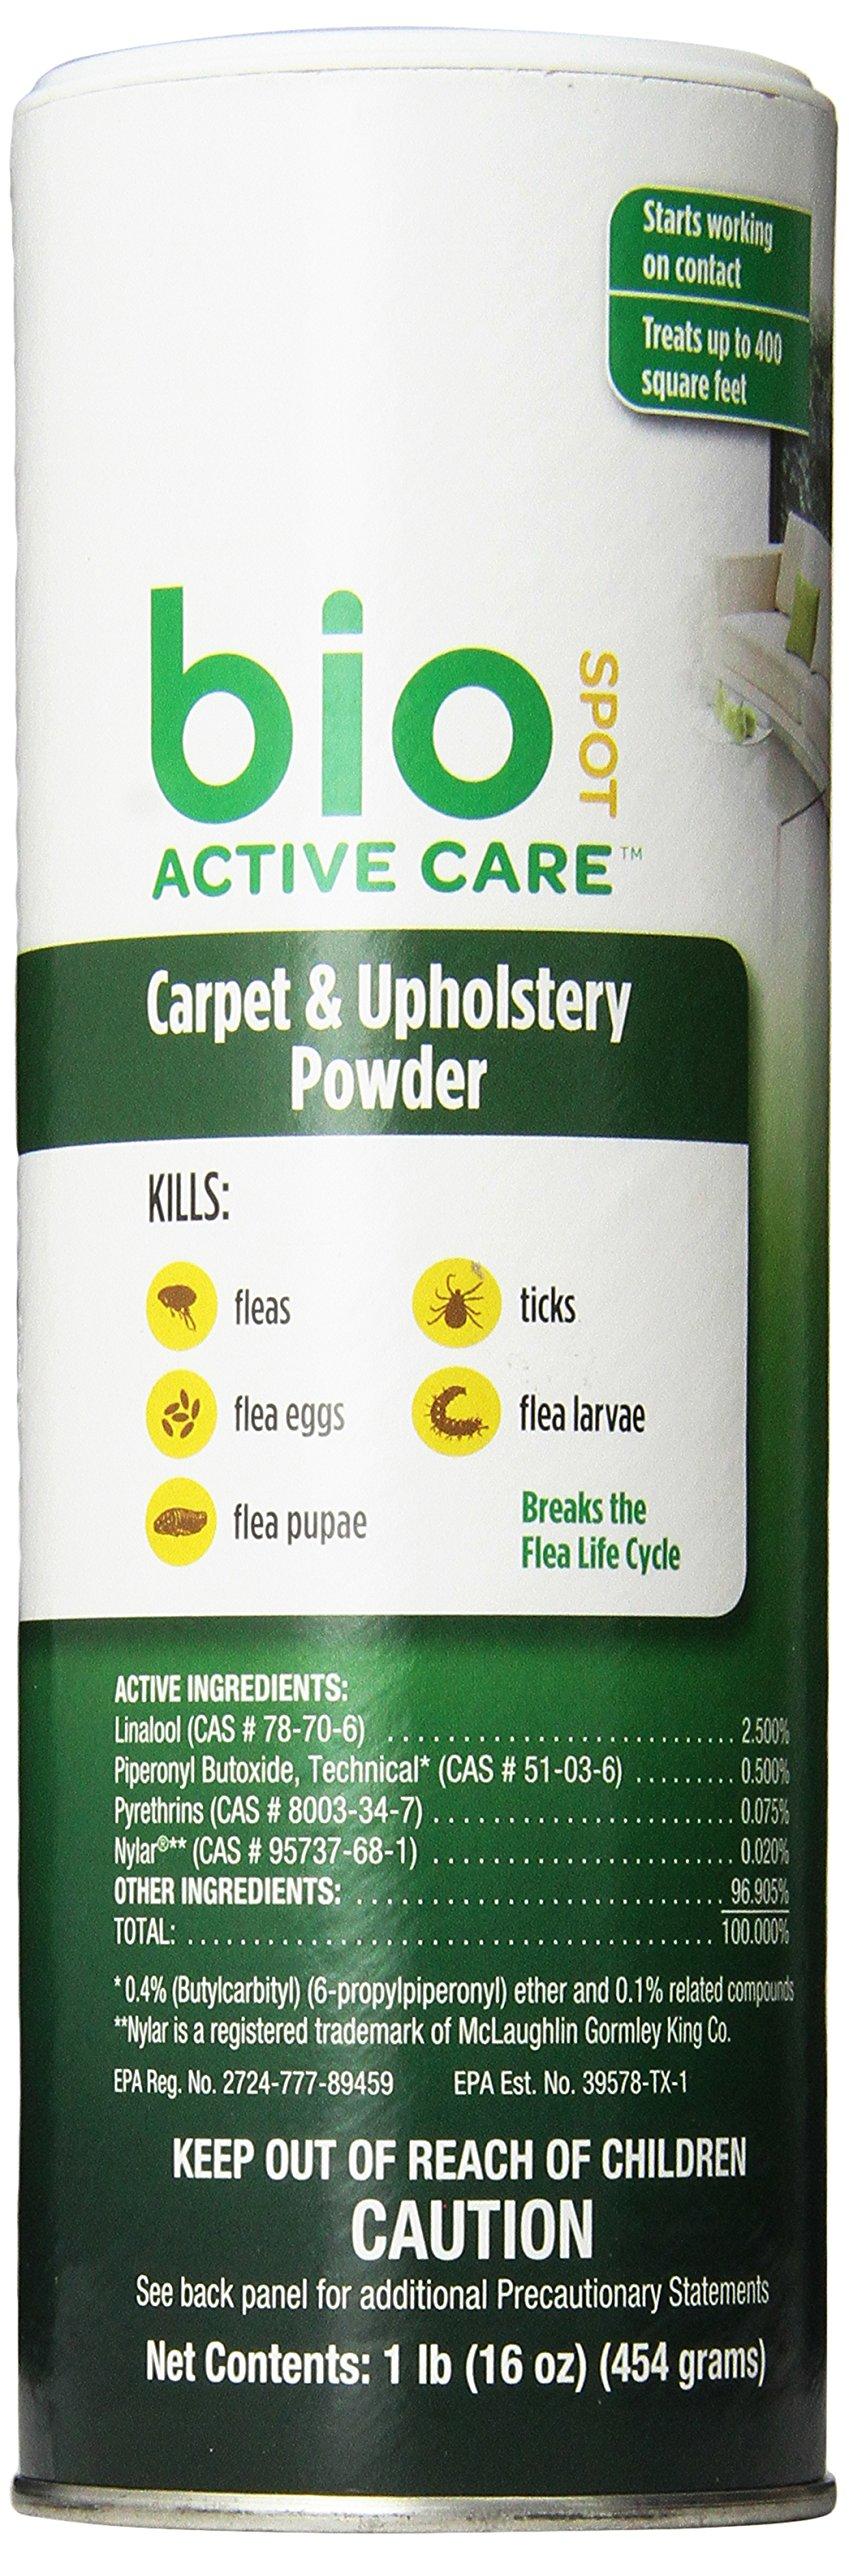 Bio Spot Active Care Carpet Powder 16 oz